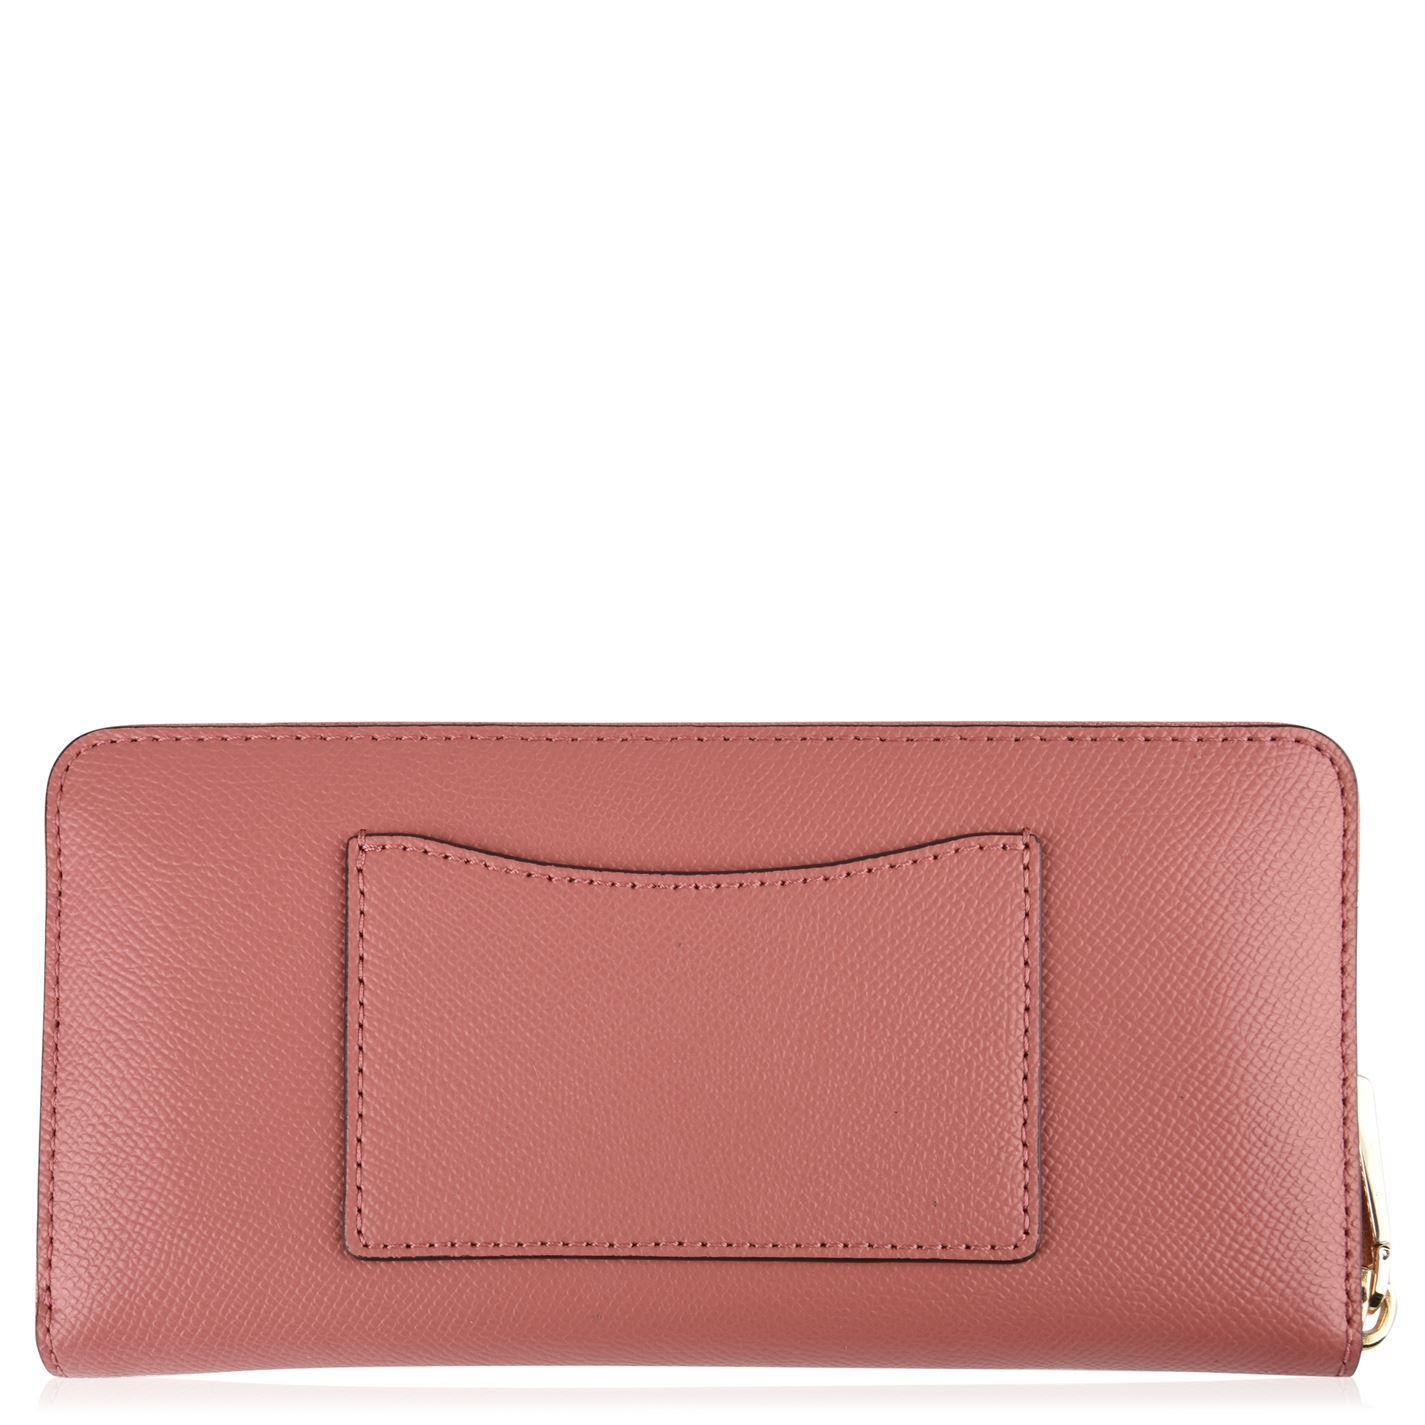 e03761f90f19 MICHAEL Michael Kors - Pink Leather Continental Wallet - Lyst. View  fullscreen